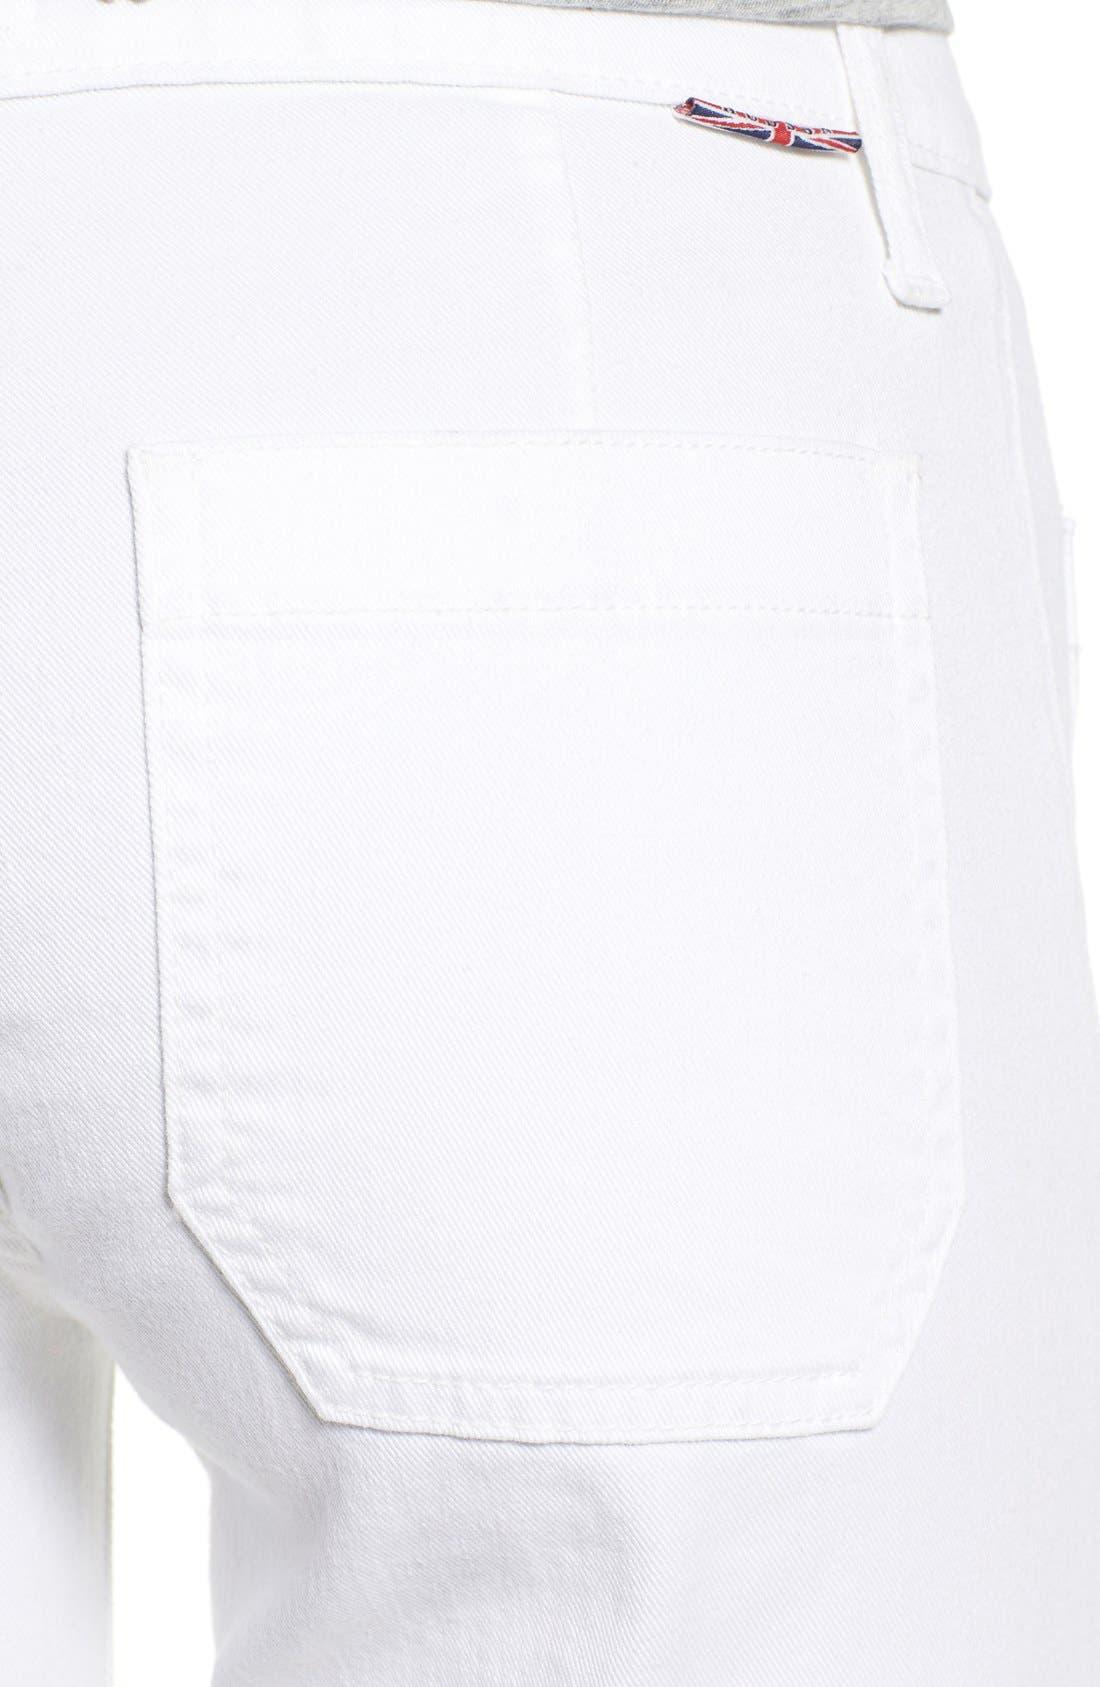 'Libby' Wide Leg Sailor Jeans,                             Alternate thumbnail 4, color,                             White2